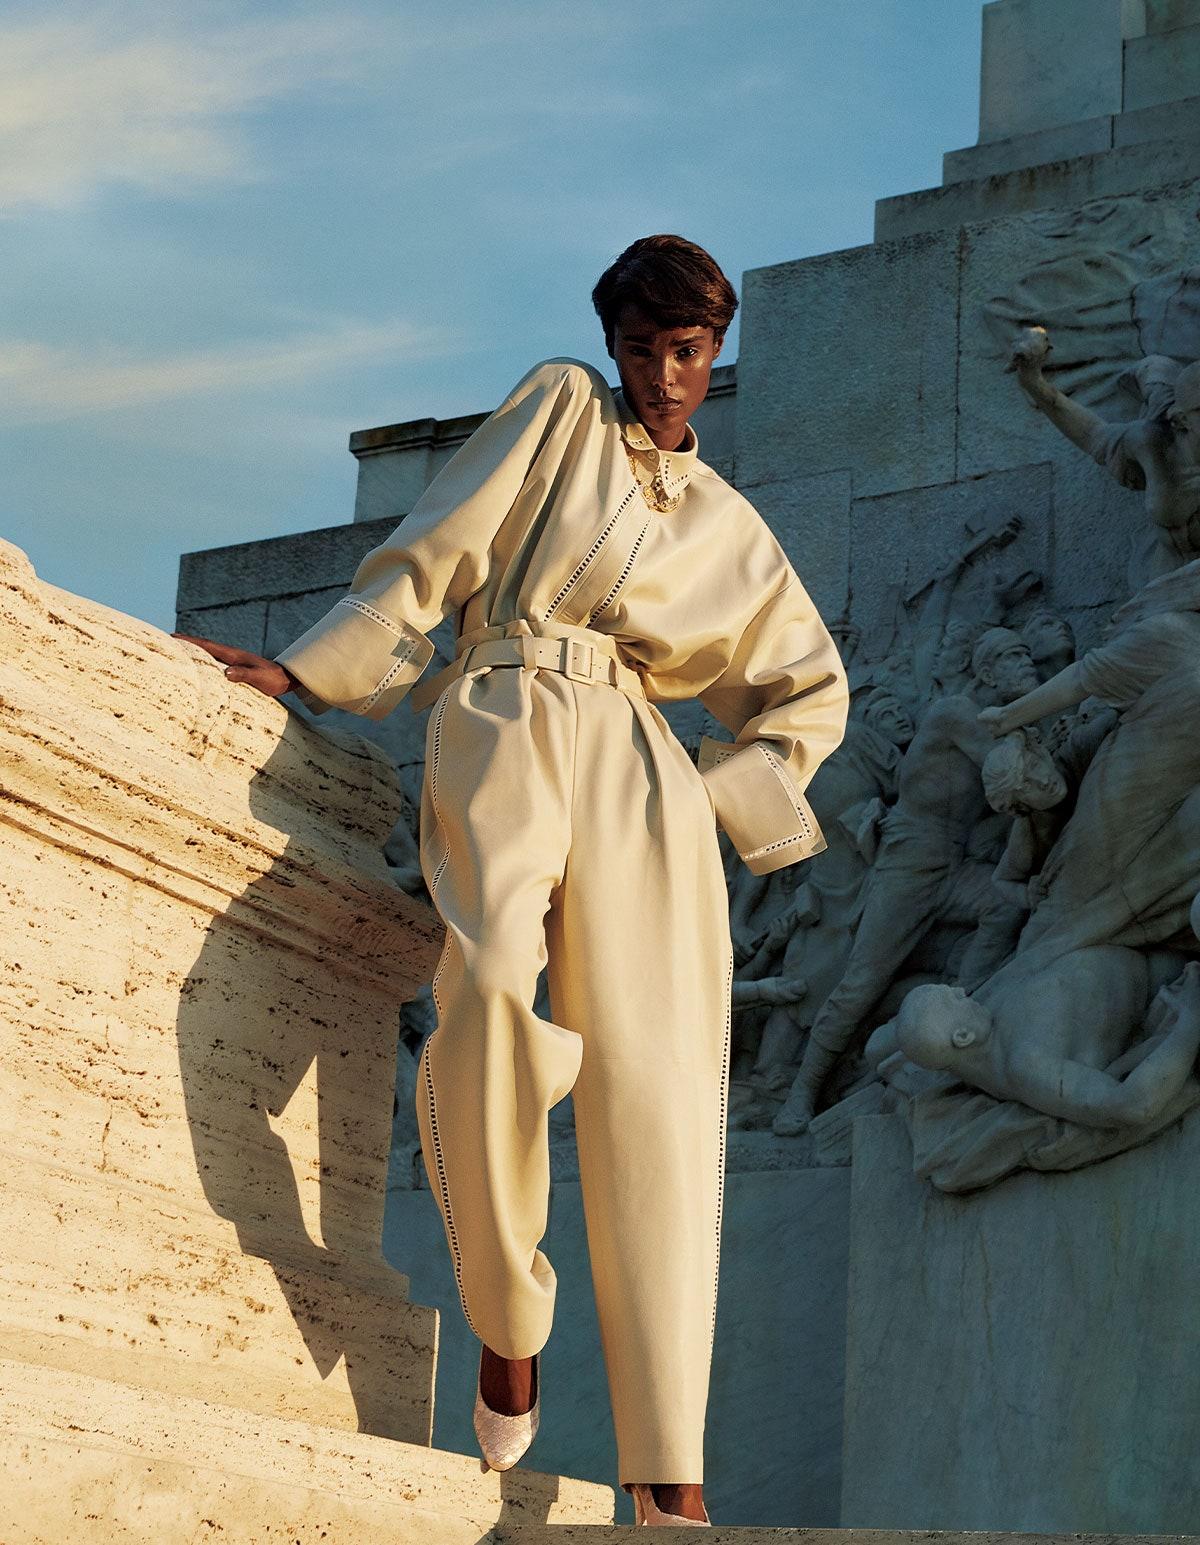 Malika Louback by Camilla Akrans for Vogue Japan September 2021